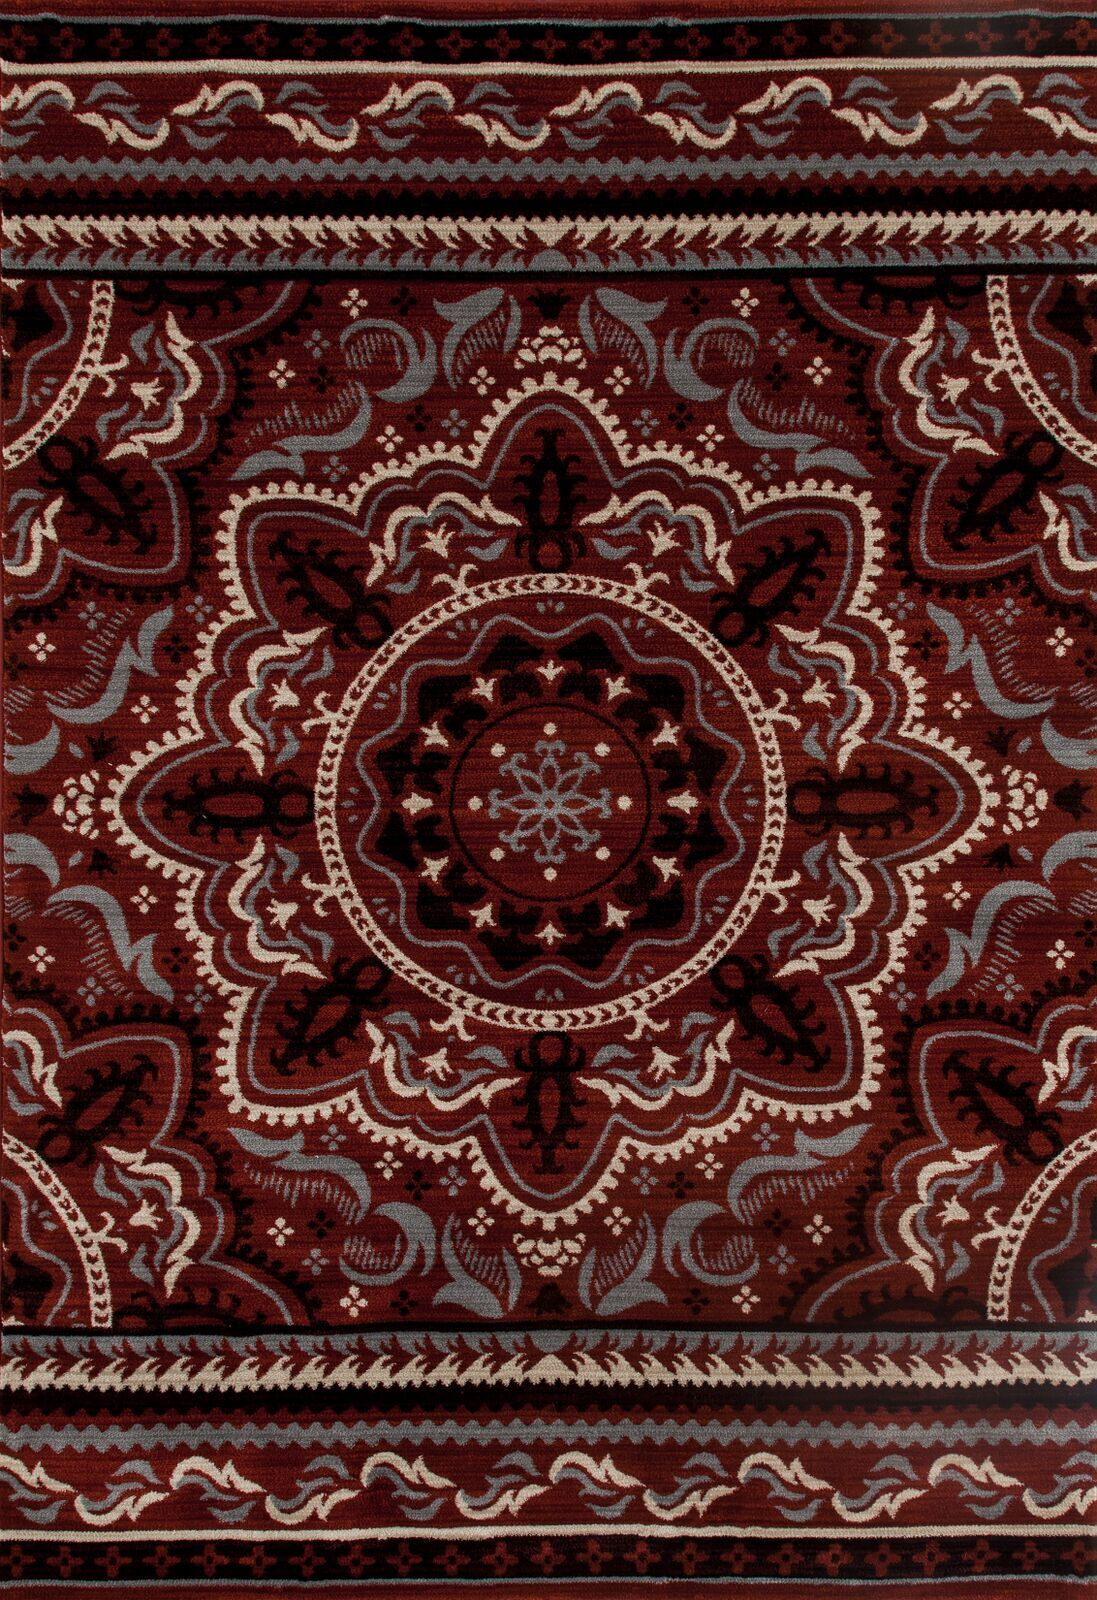 Highland Red Area Rug Rug Size: 6'7 x 9'2